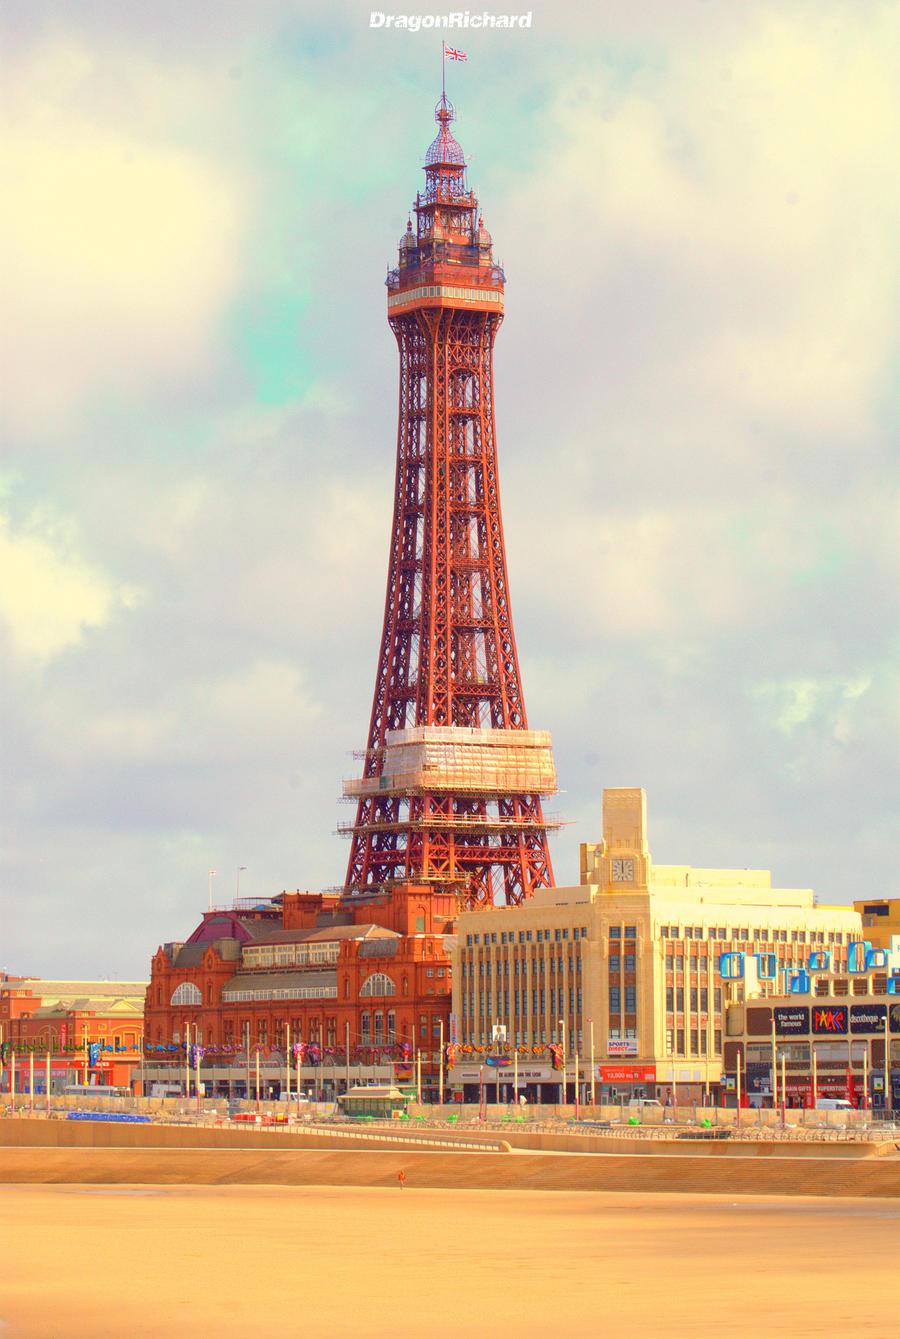 Blackpool Tower by DragonRichard on DeviantArt